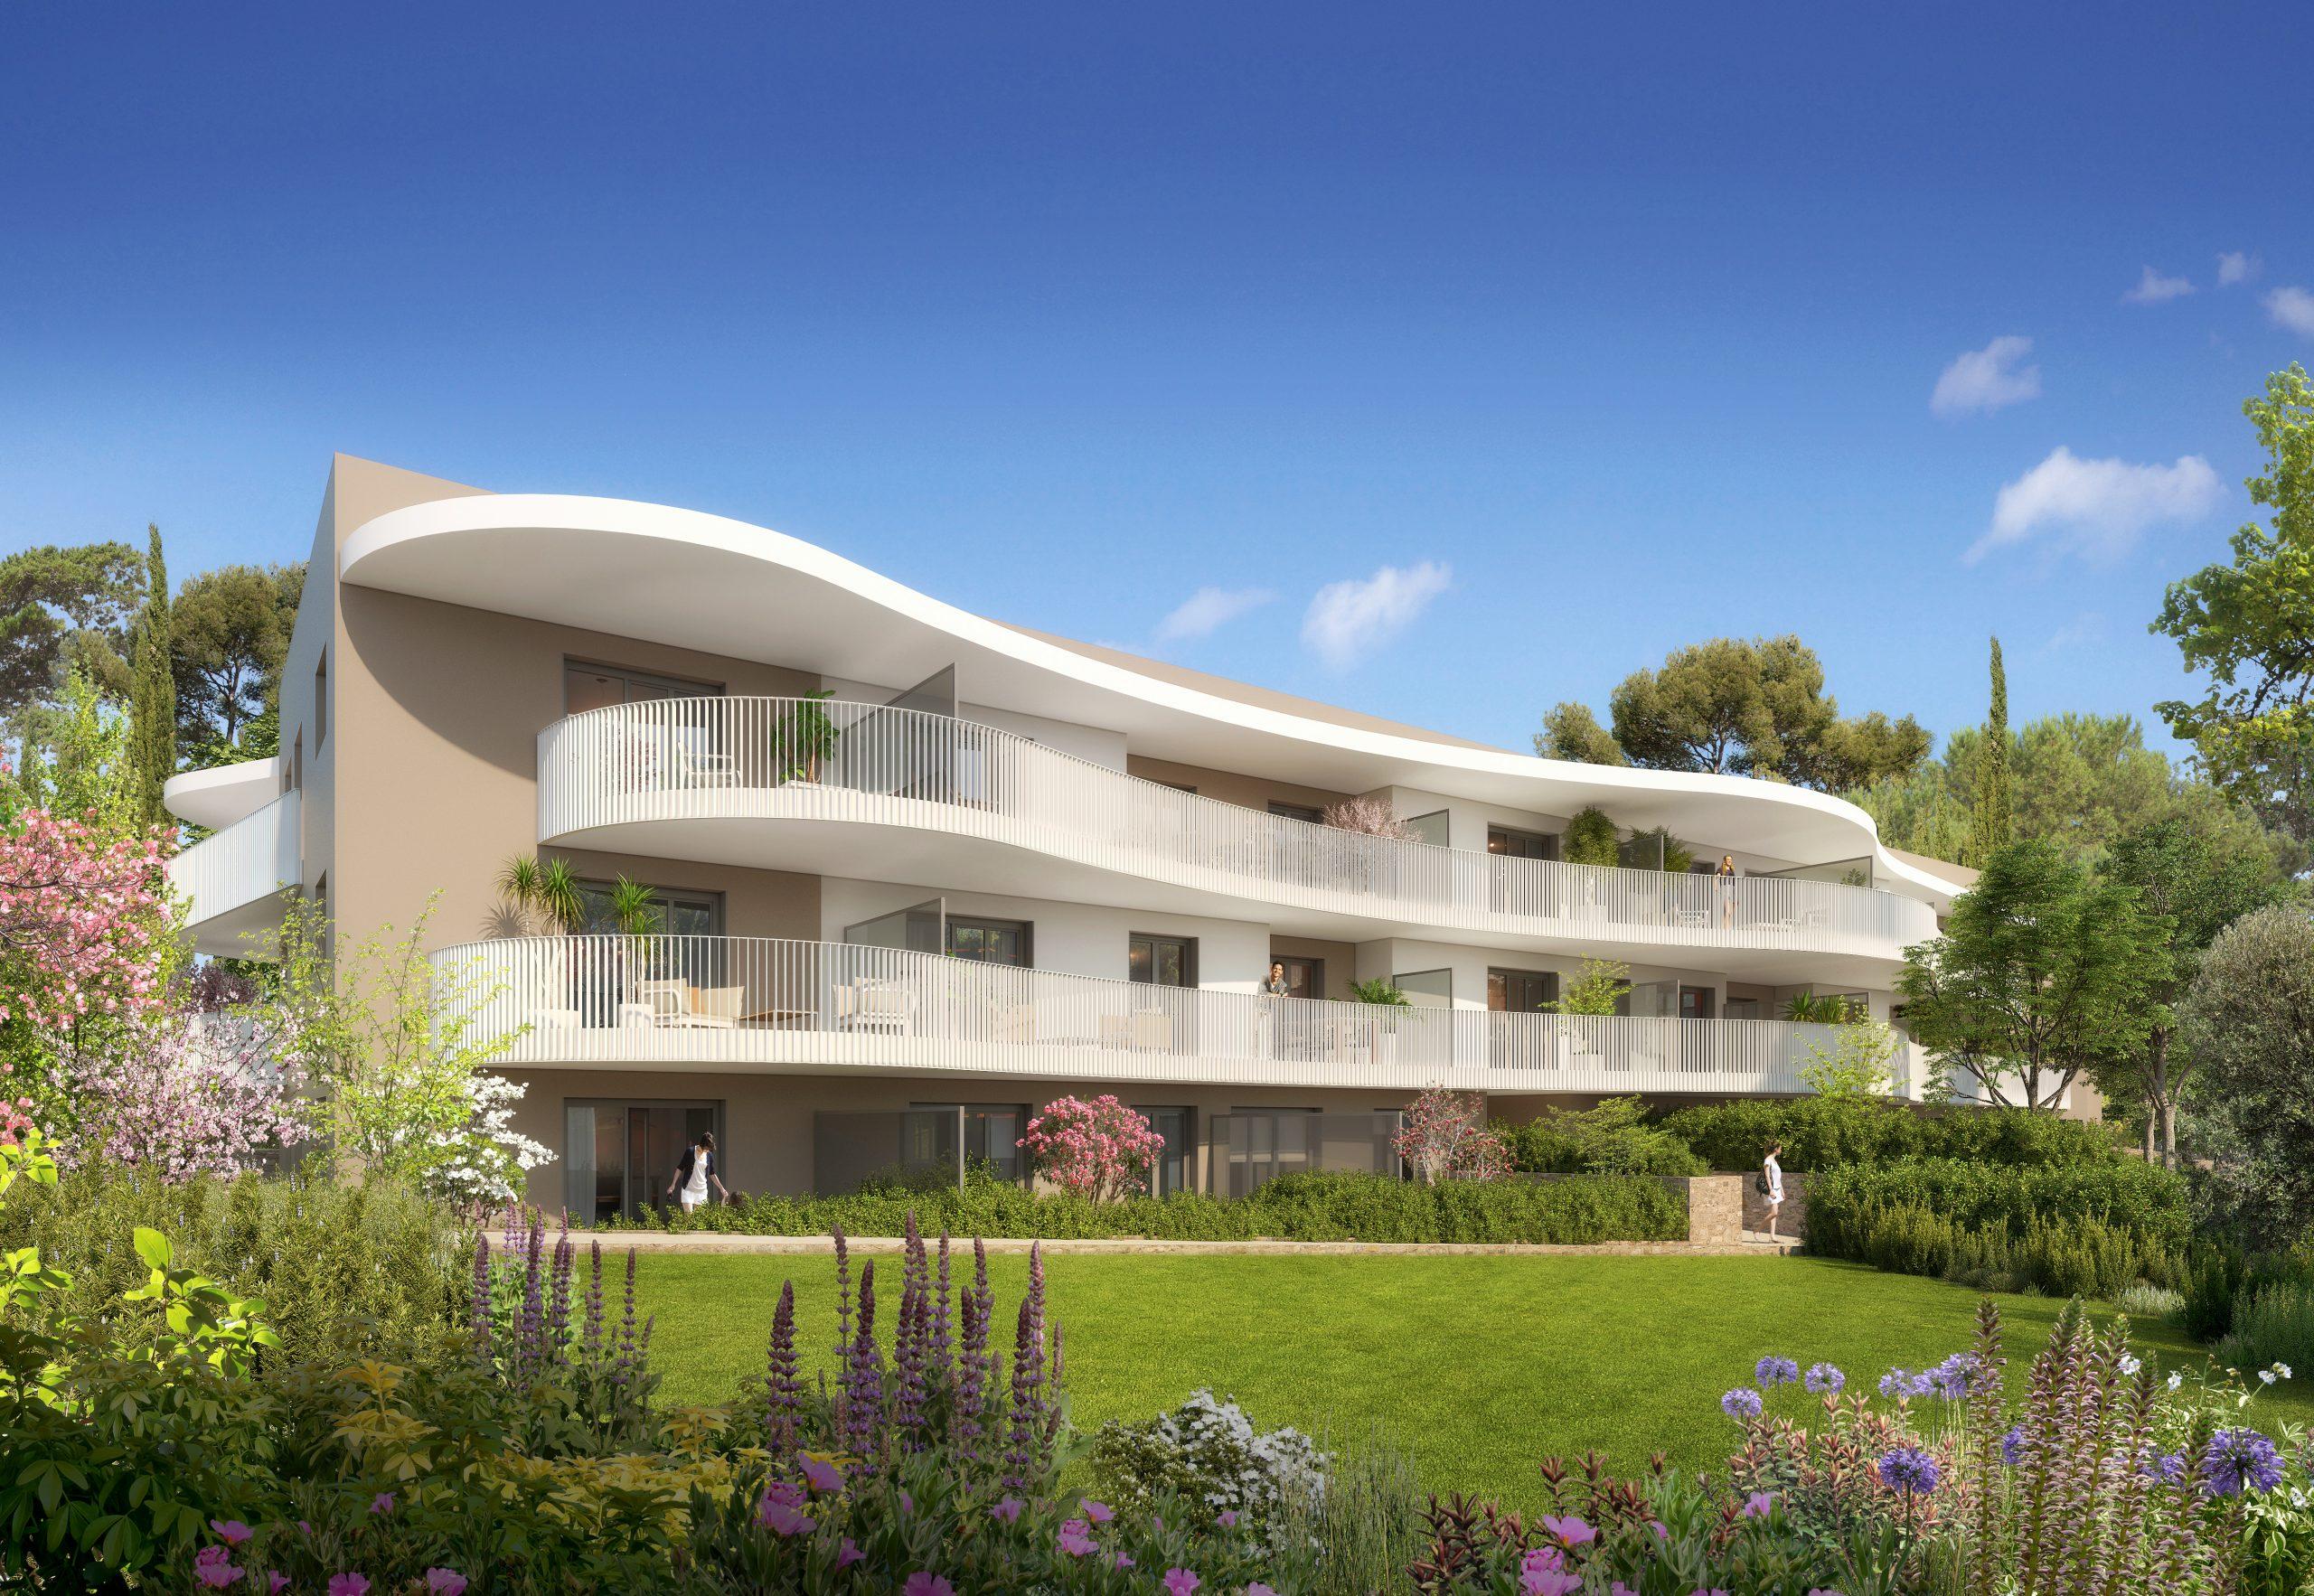 Villeneuve-Loubet (06270) appartement neuf achat pinel residence neuve nice cannes monaco standing investissement